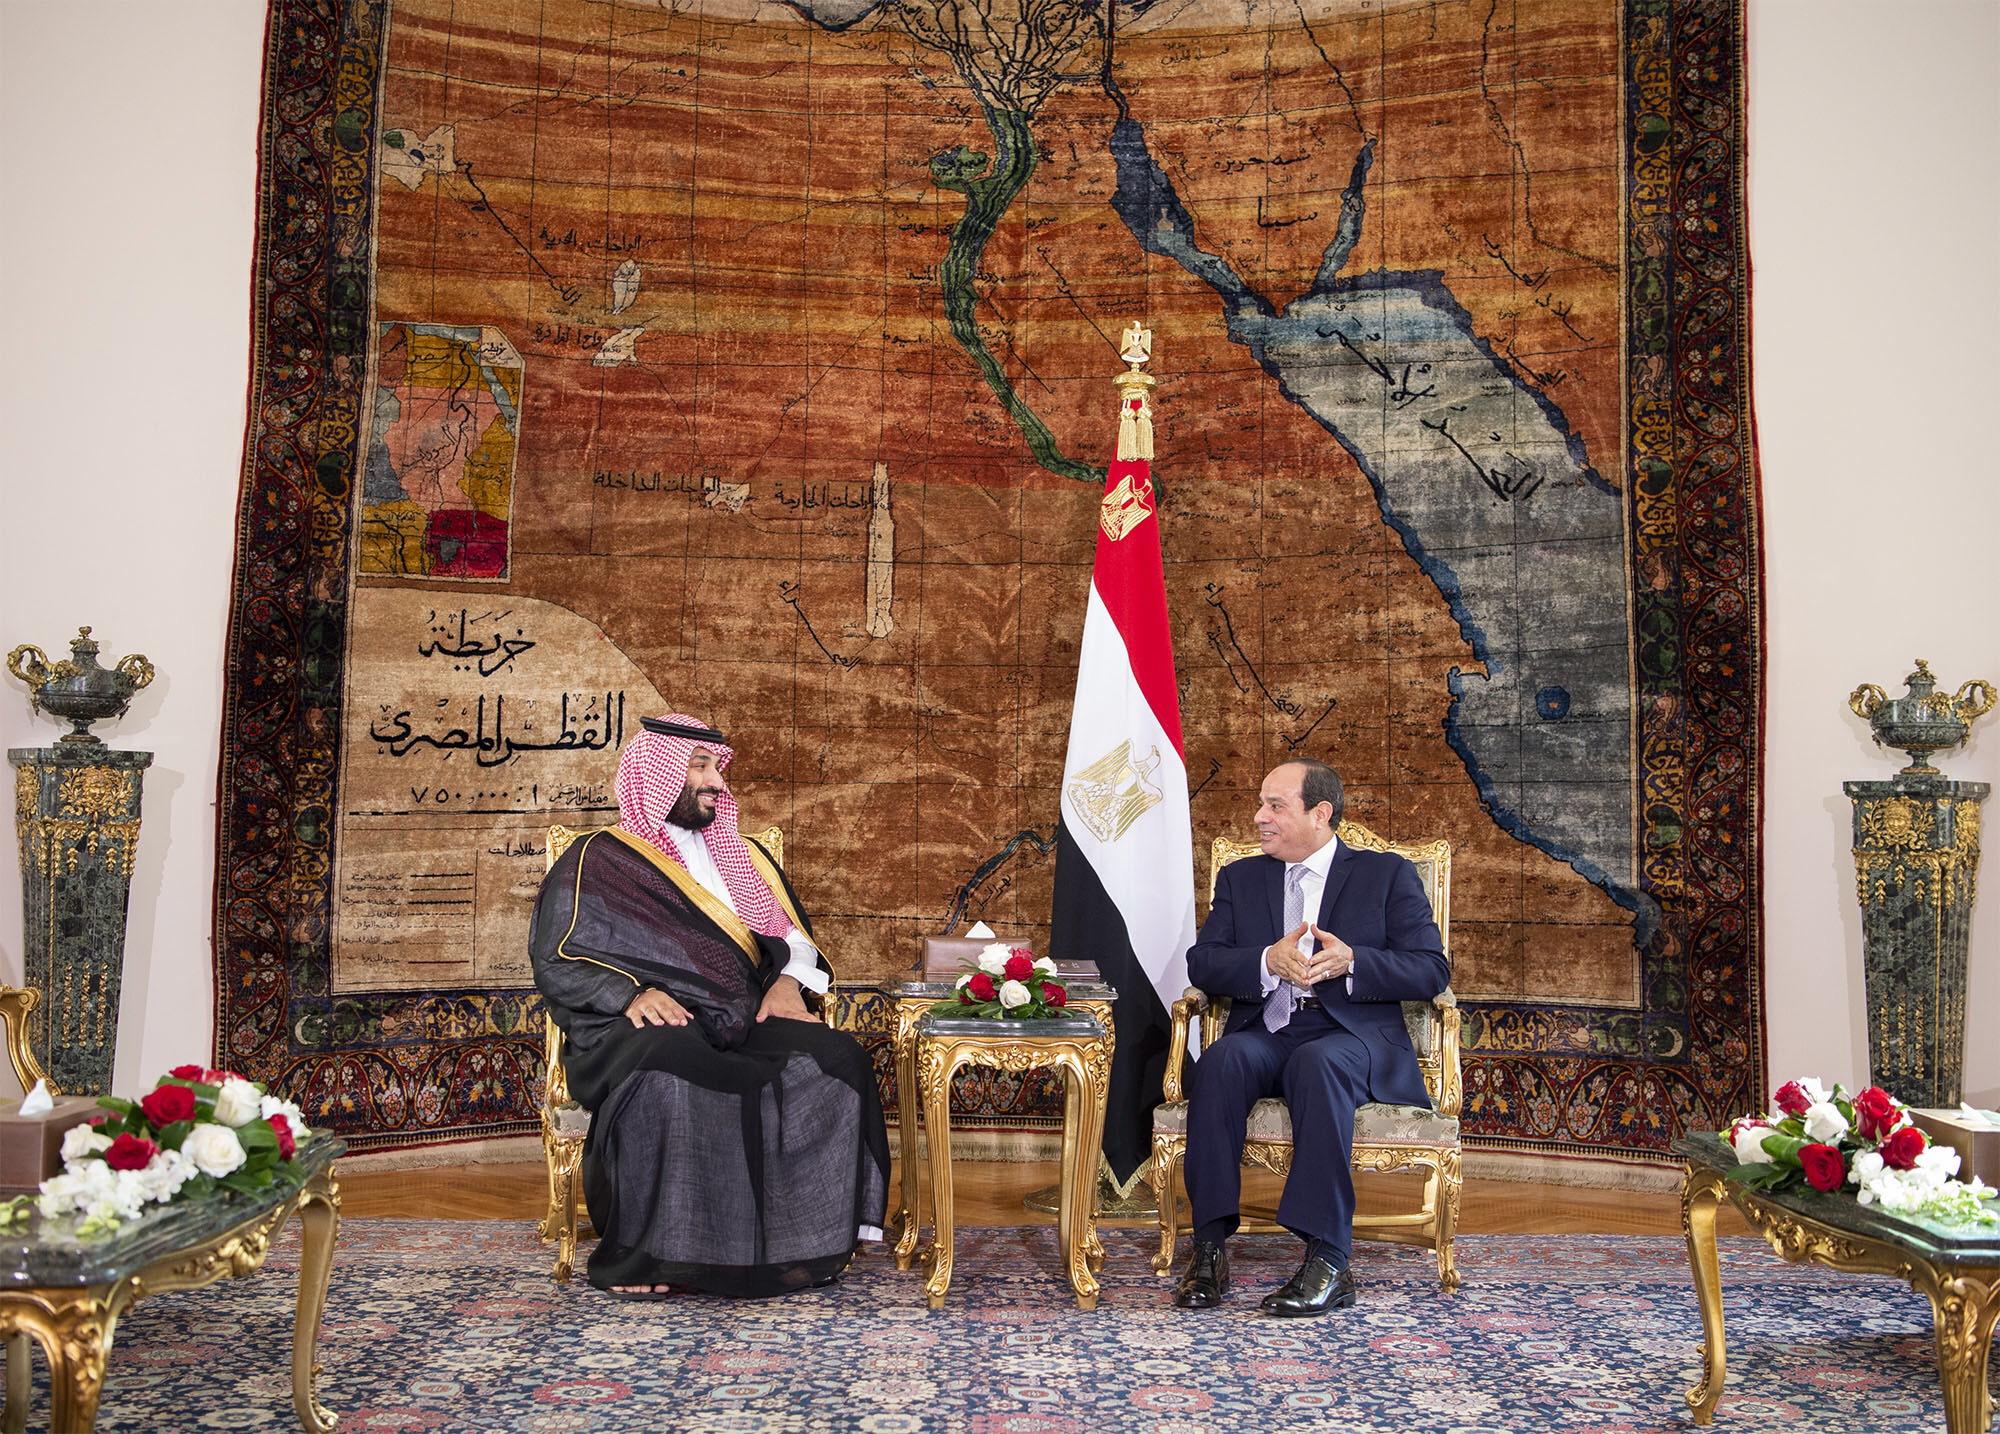 Macron će se sastati s Mohammedom bin Salmanom na G20 i uskladiti Europljane